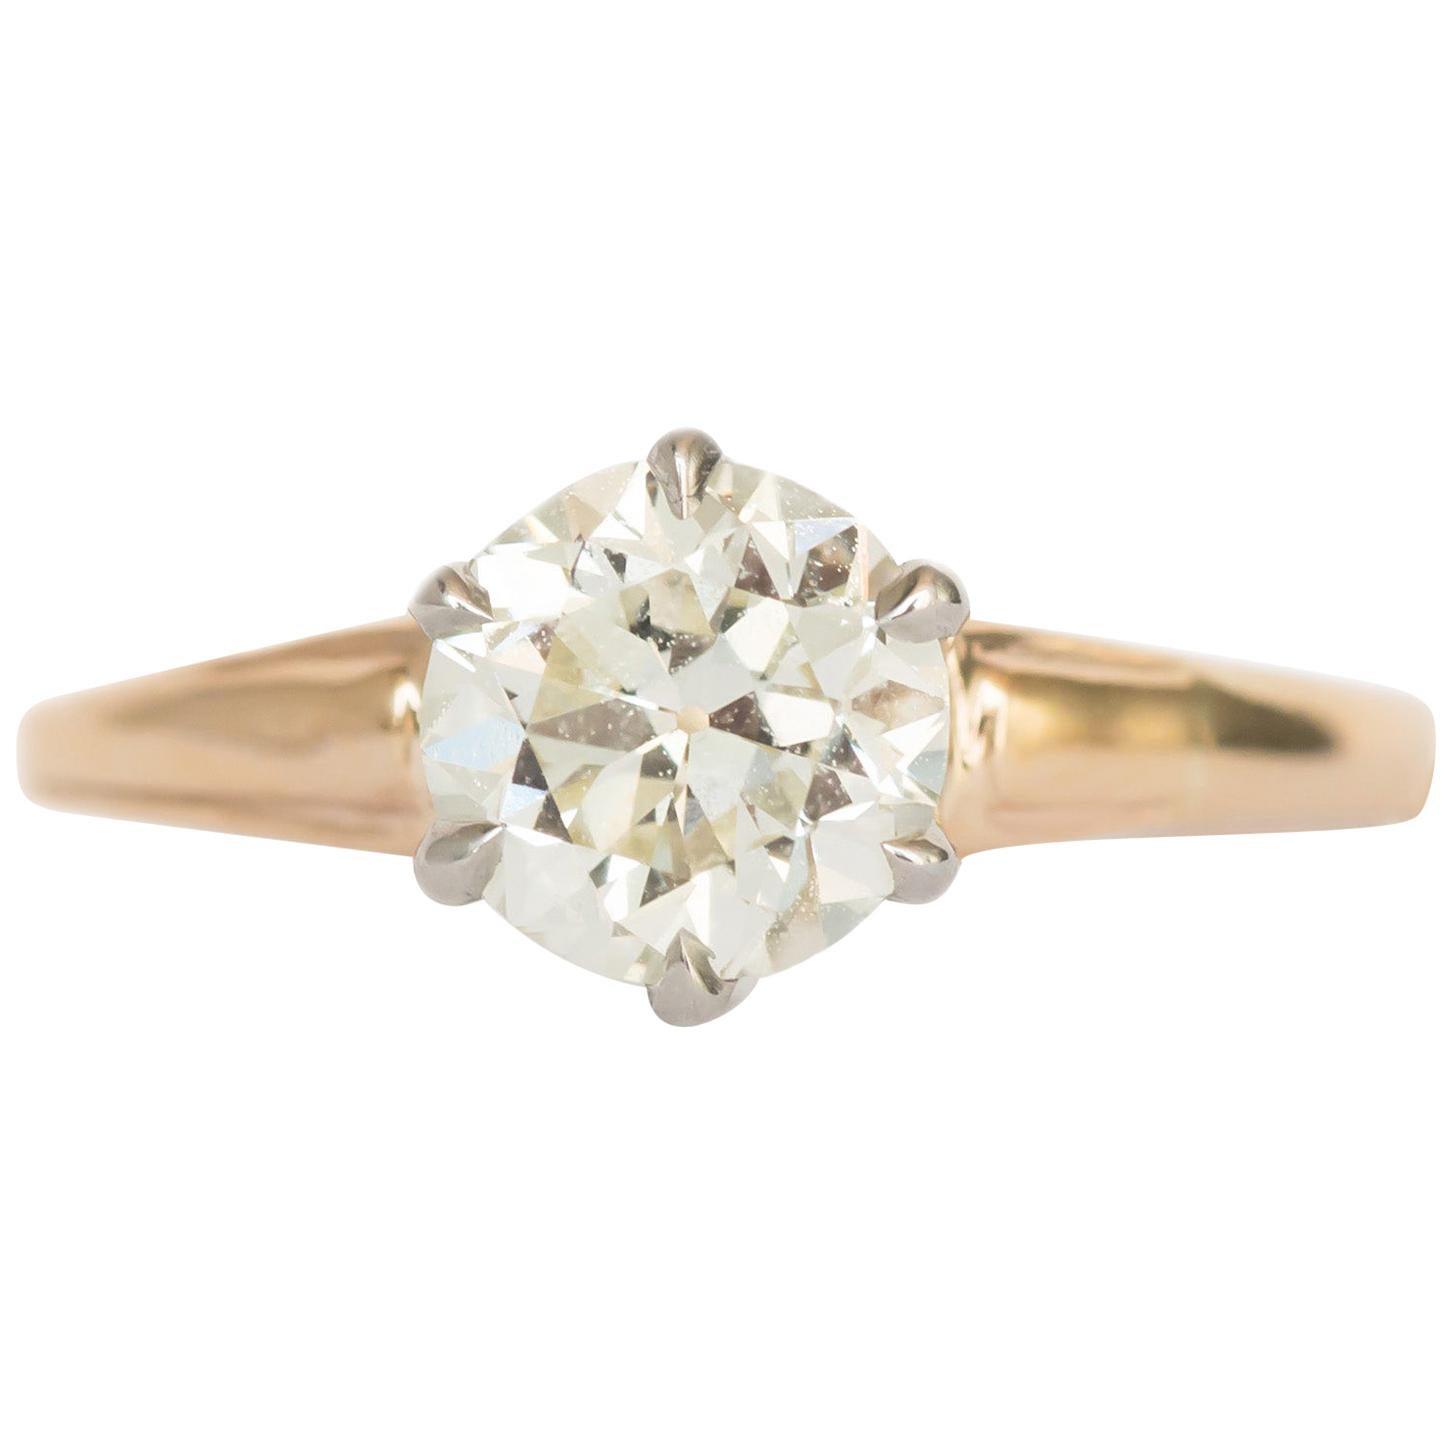 1.05 Carat Diamond Yellow Gold and Platinum Engagement Ring